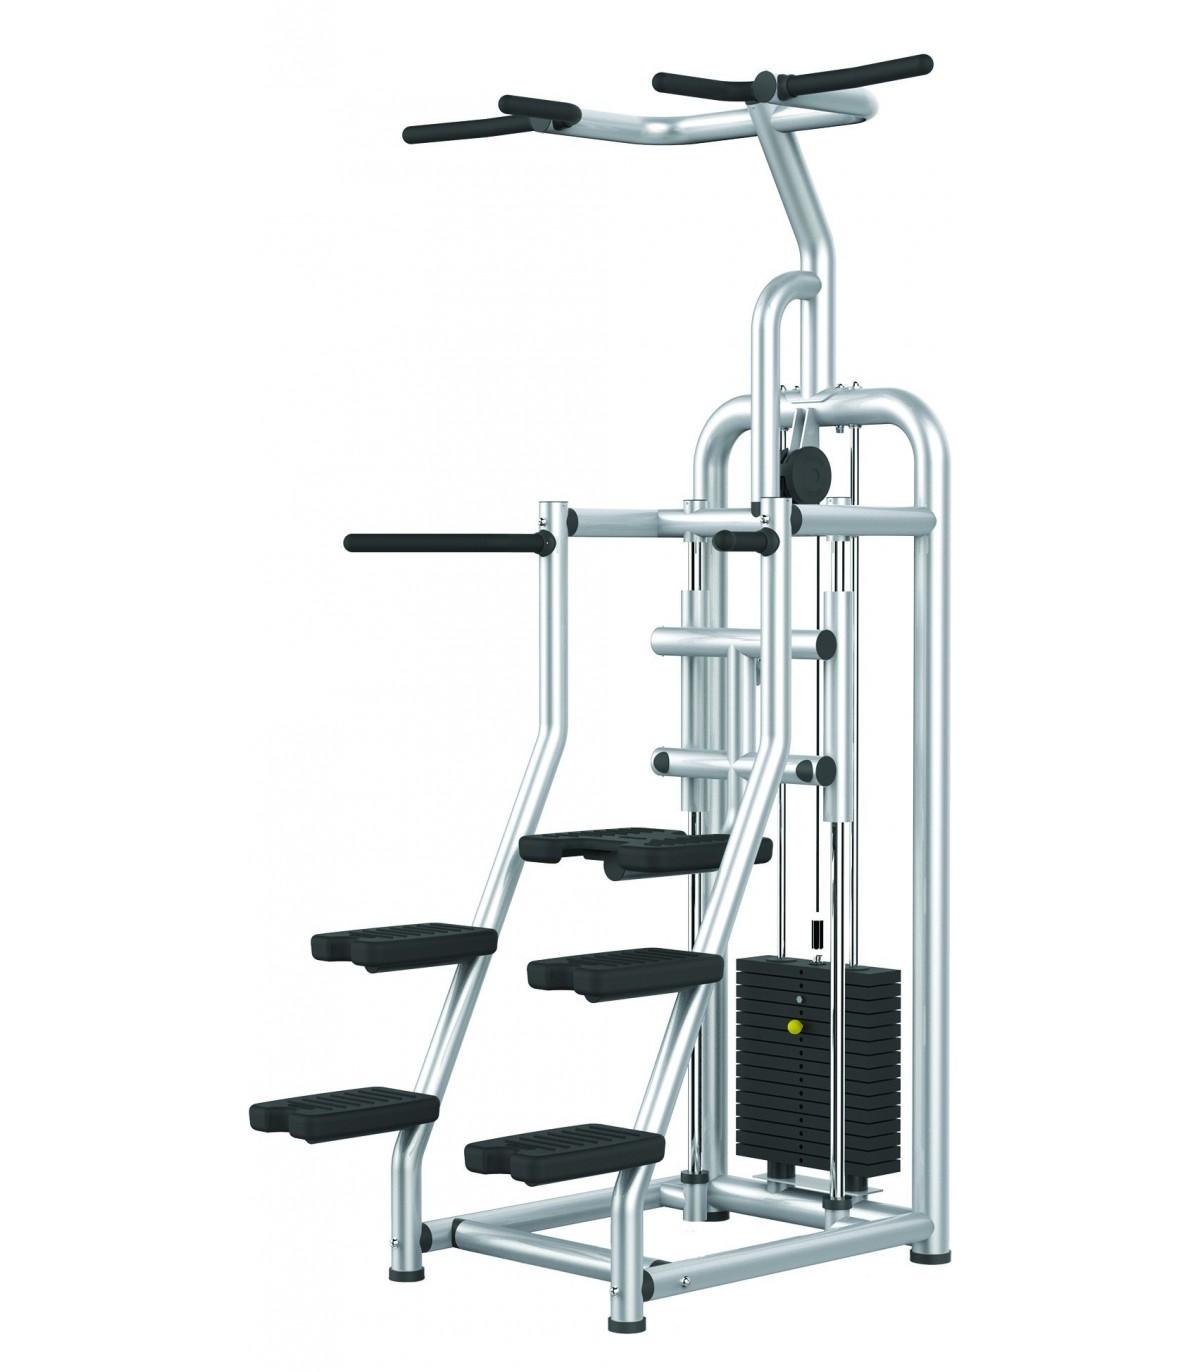 banc de musculation professionnel gravitron care fitness. Black Bedroom Furniture Sets. Home Design Ideas